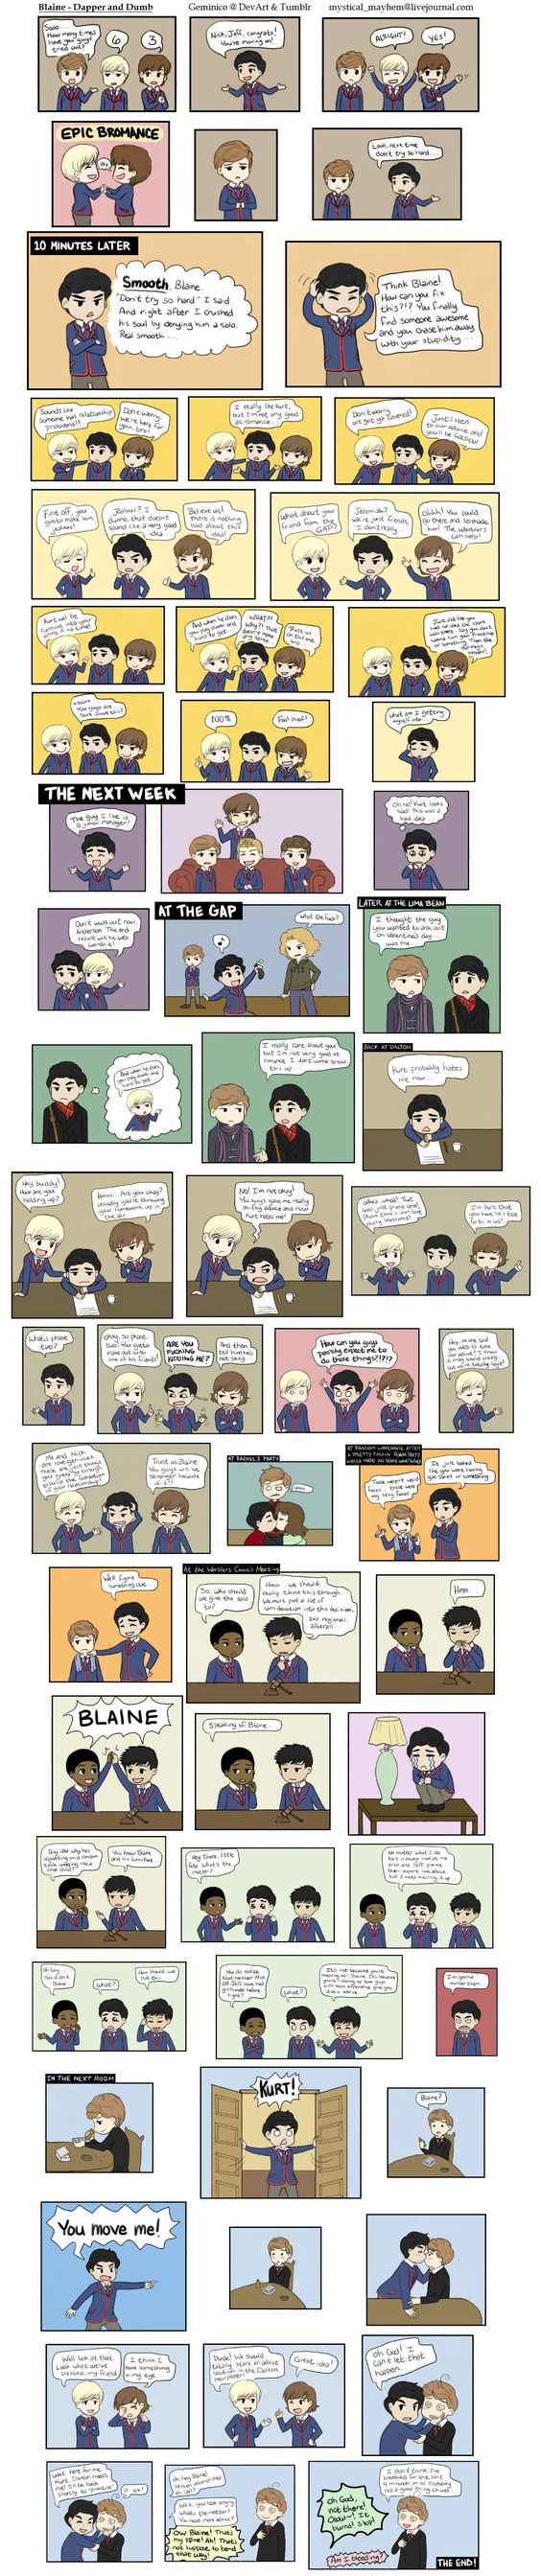 Blaine - Dapper and Dumb Comic by Geminico